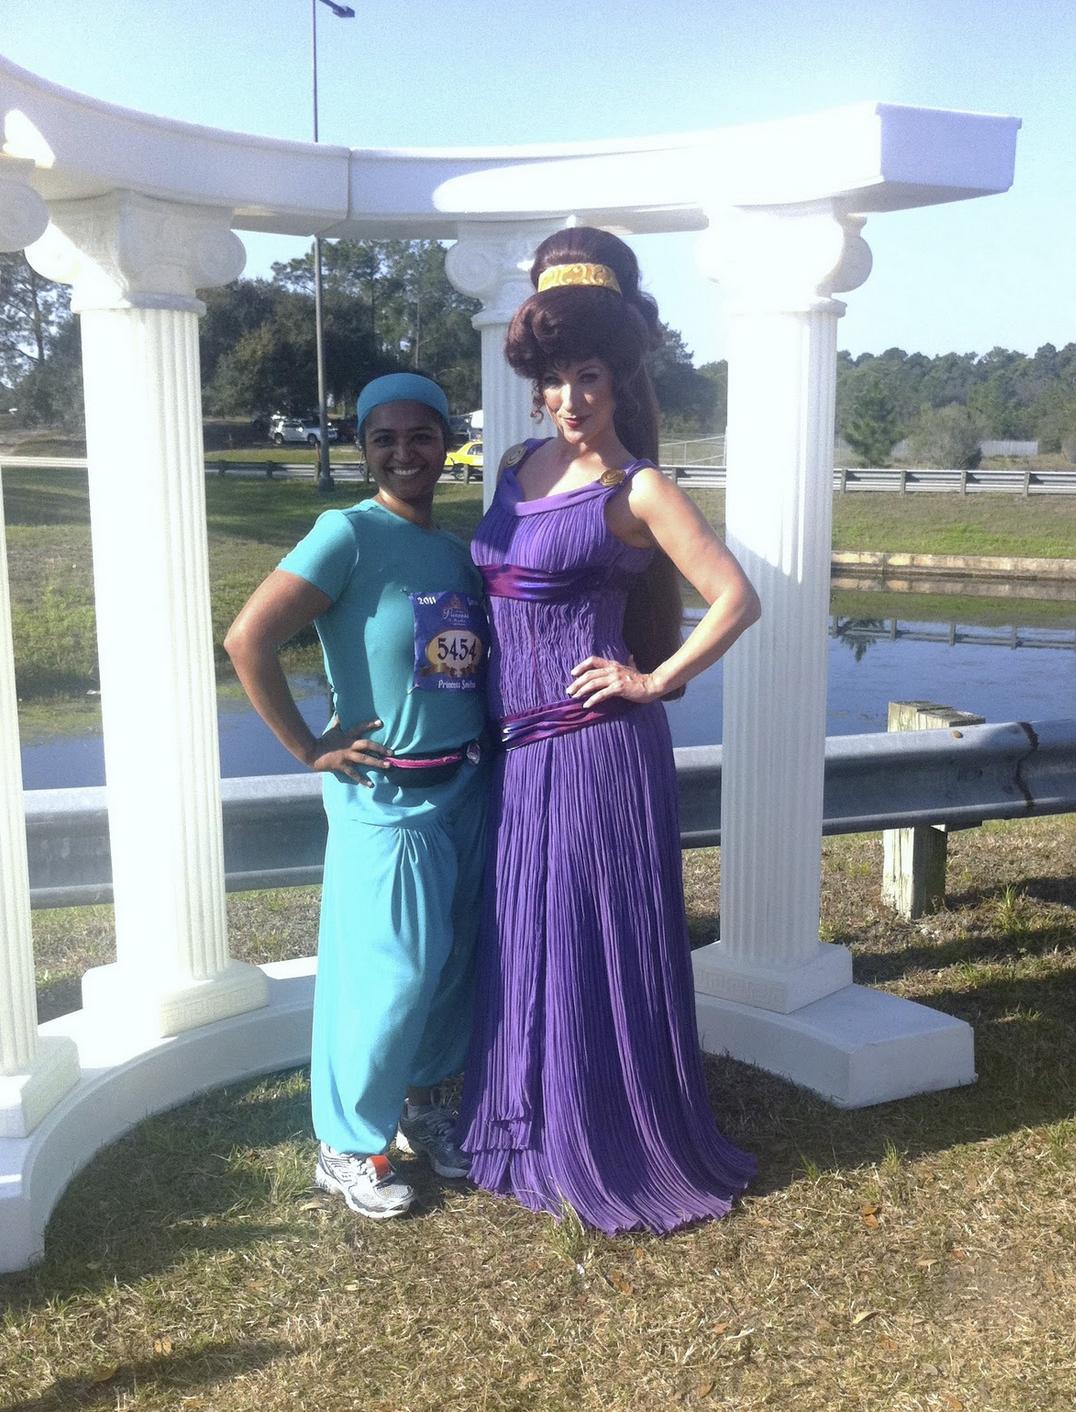 Megara & Me